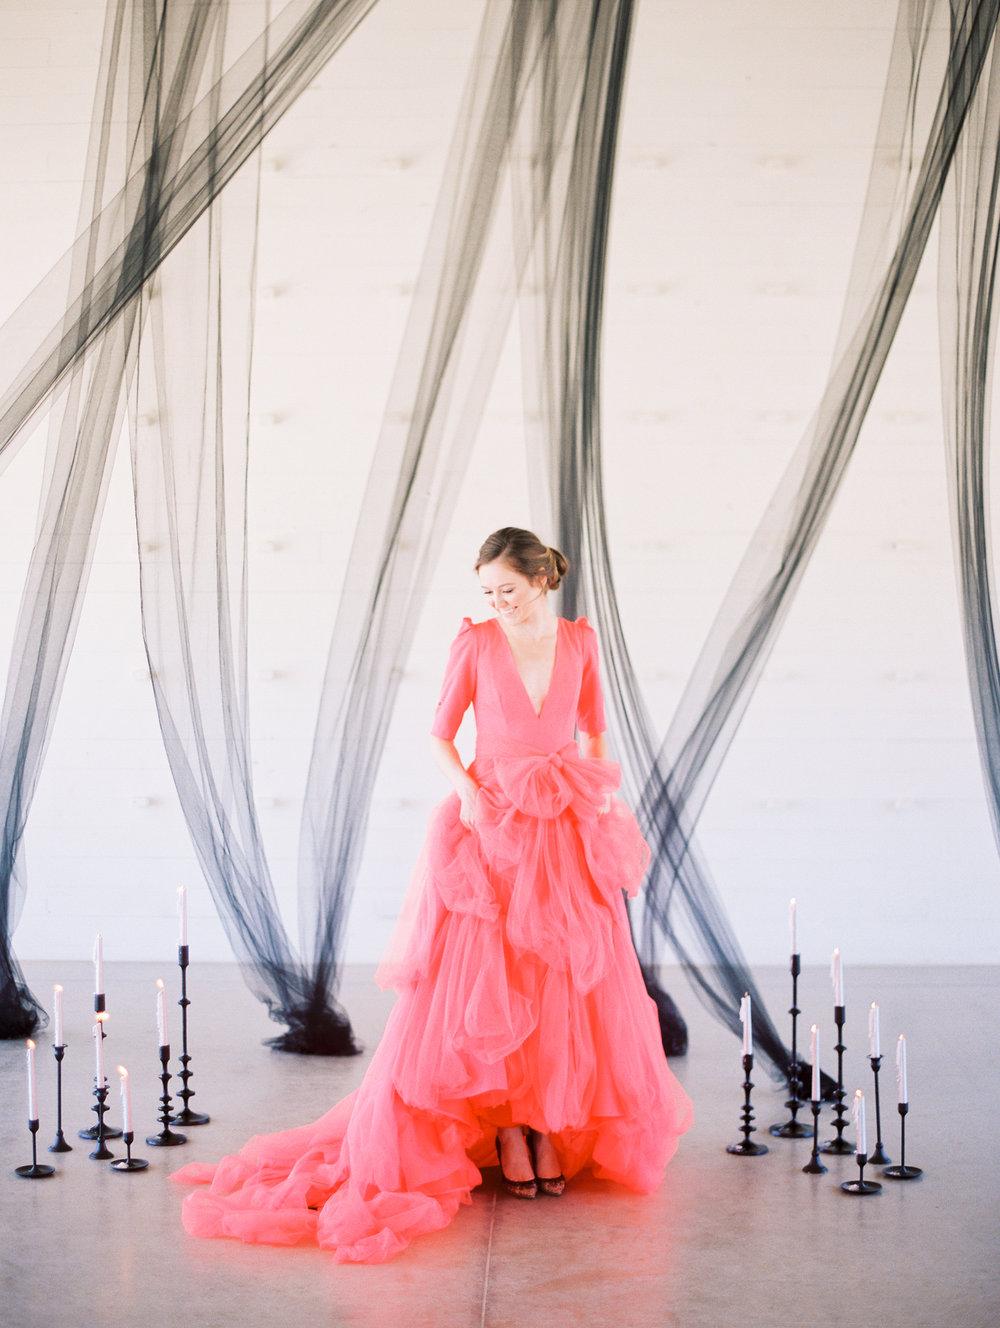 Kristin-La-Voie-Photography-Austin-Wedding-Photographer-Prospect-House-132.jpg